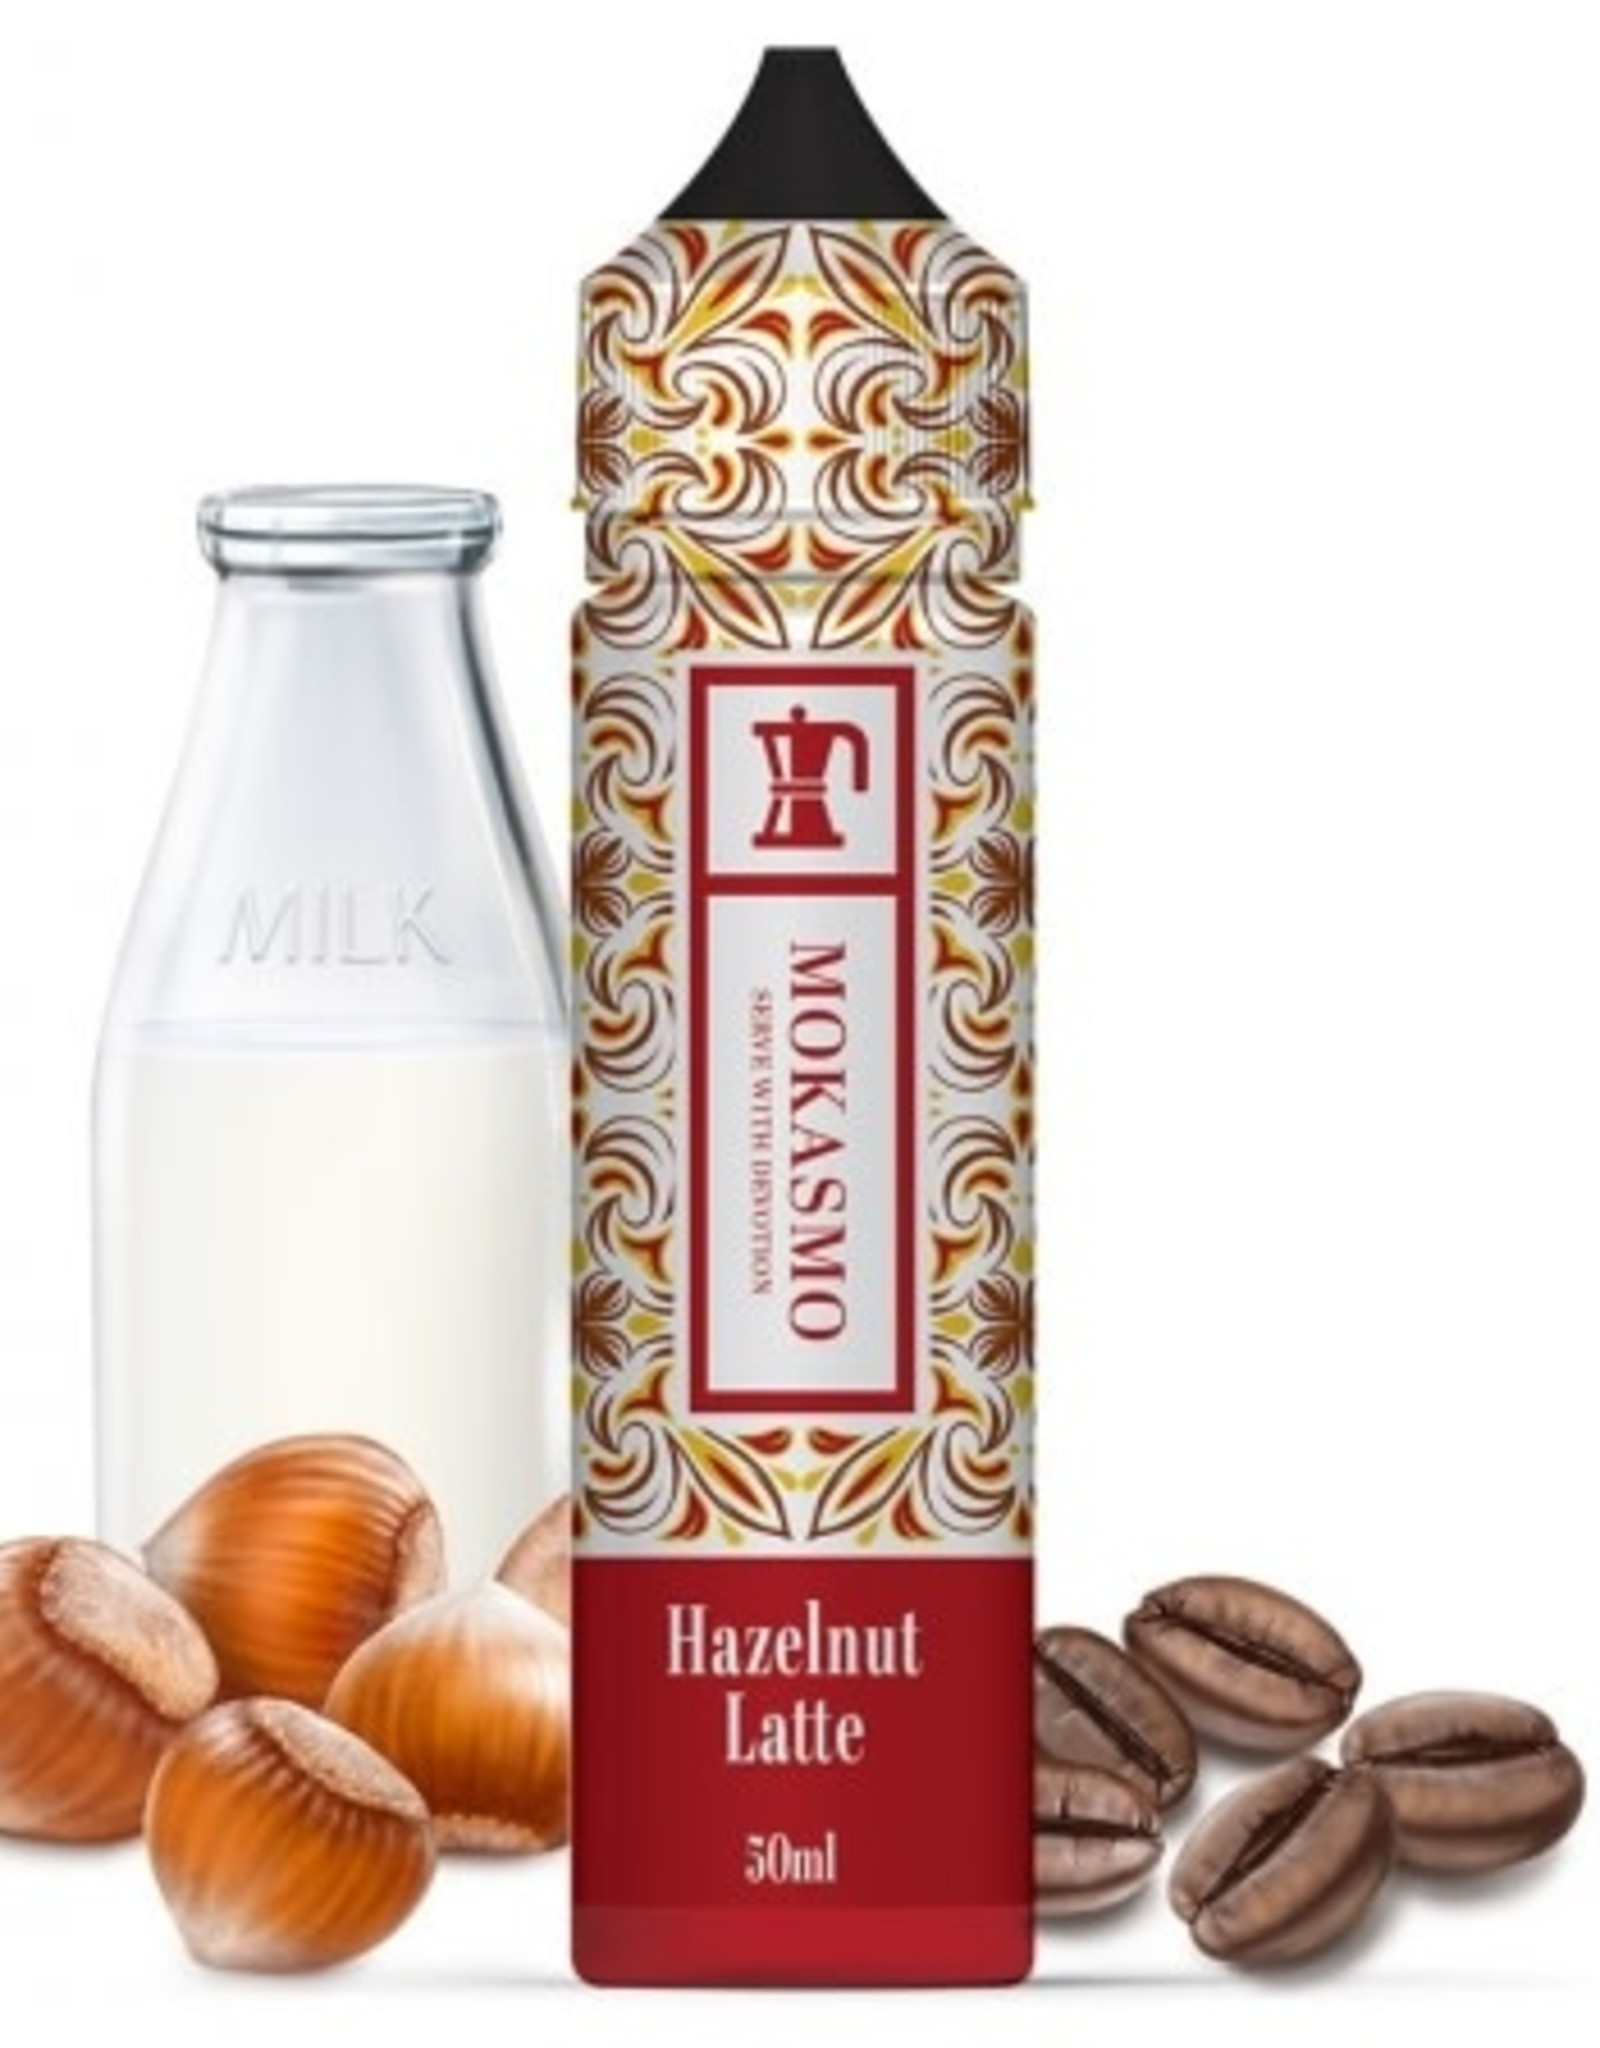 MOKASMO MOKASMO - Hazelnut Latte 50ml